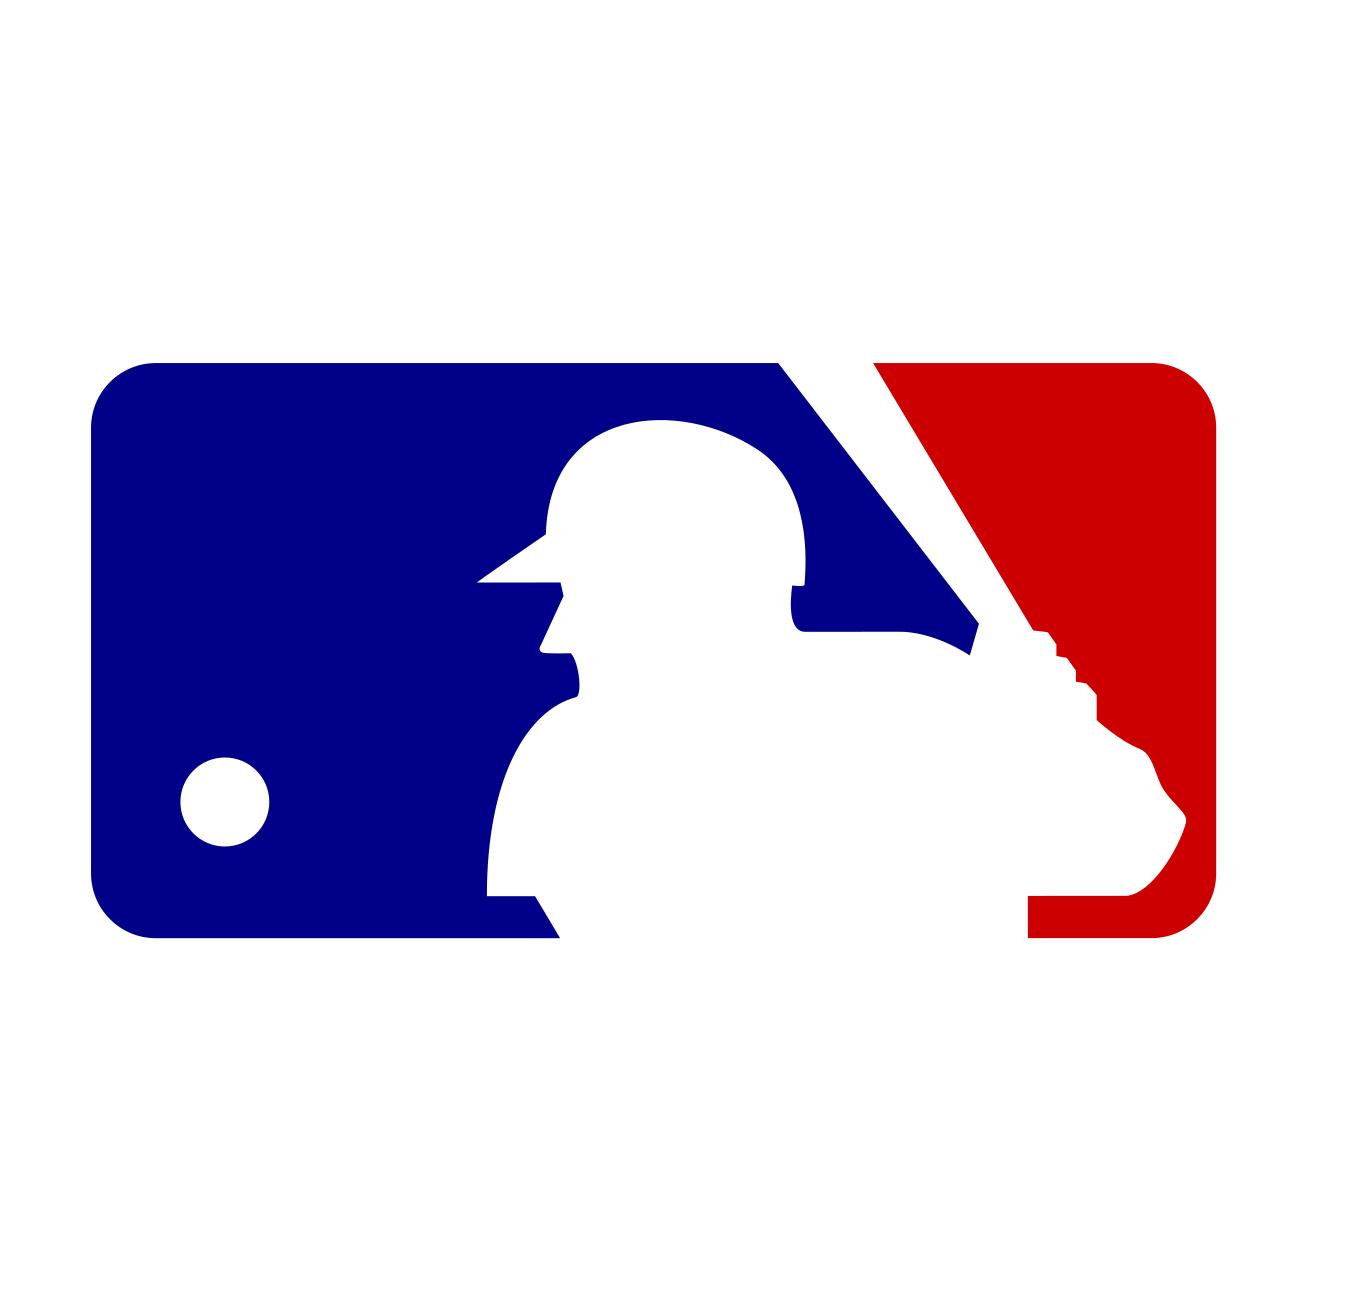 1200px-Major_League_Baseball_logo.square